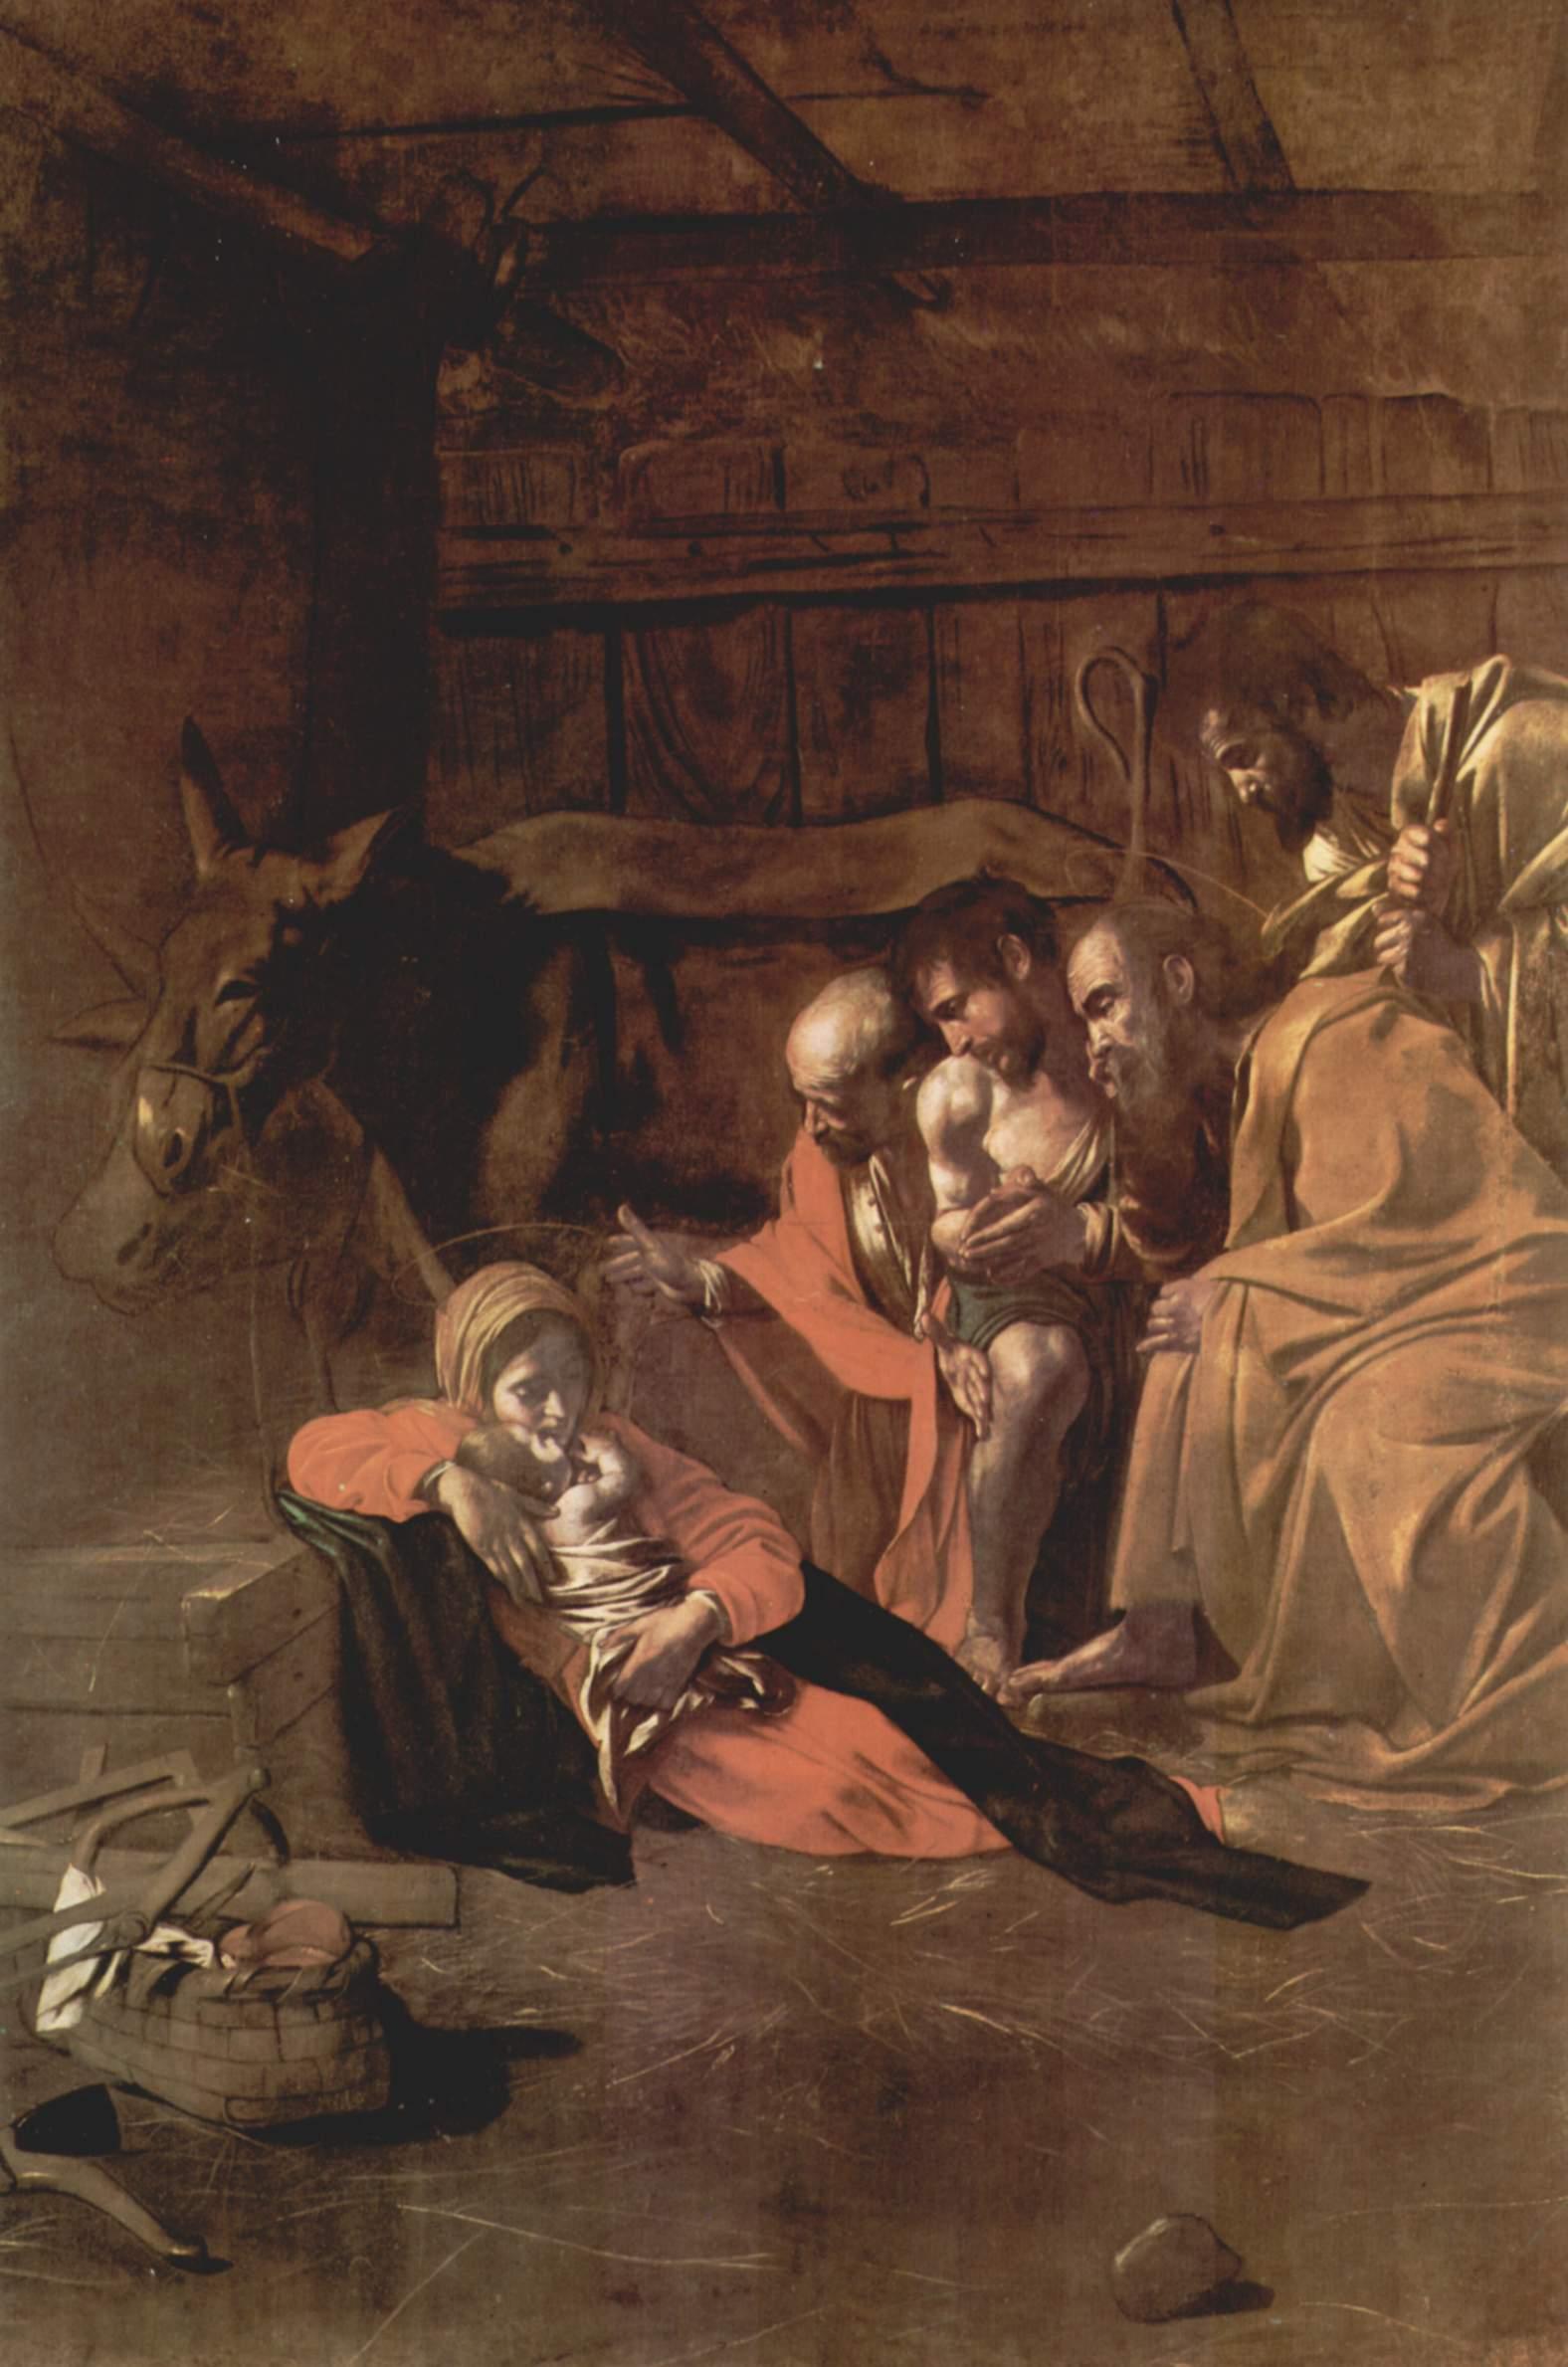 Поклонение пастухов, Микеланджело Меризи де Караваджо